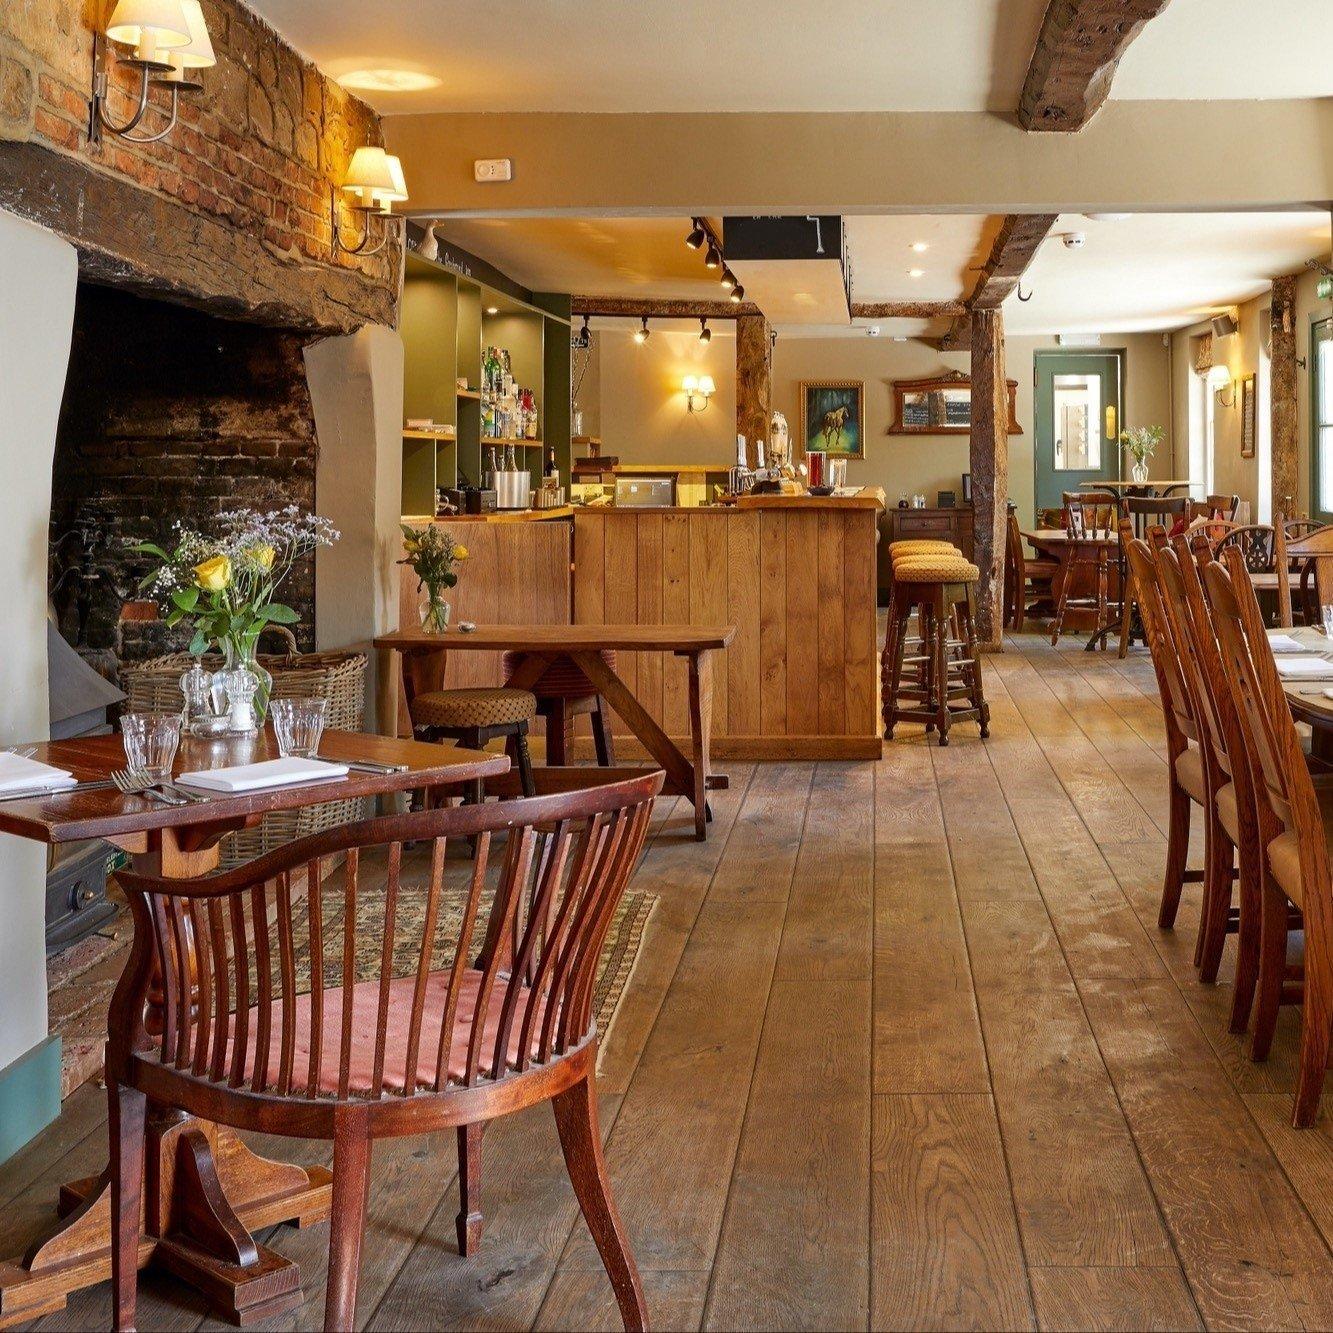 Greyhound Inn, Letcombe Regis, Wantage, Oxfordshire - Gallery Image 11